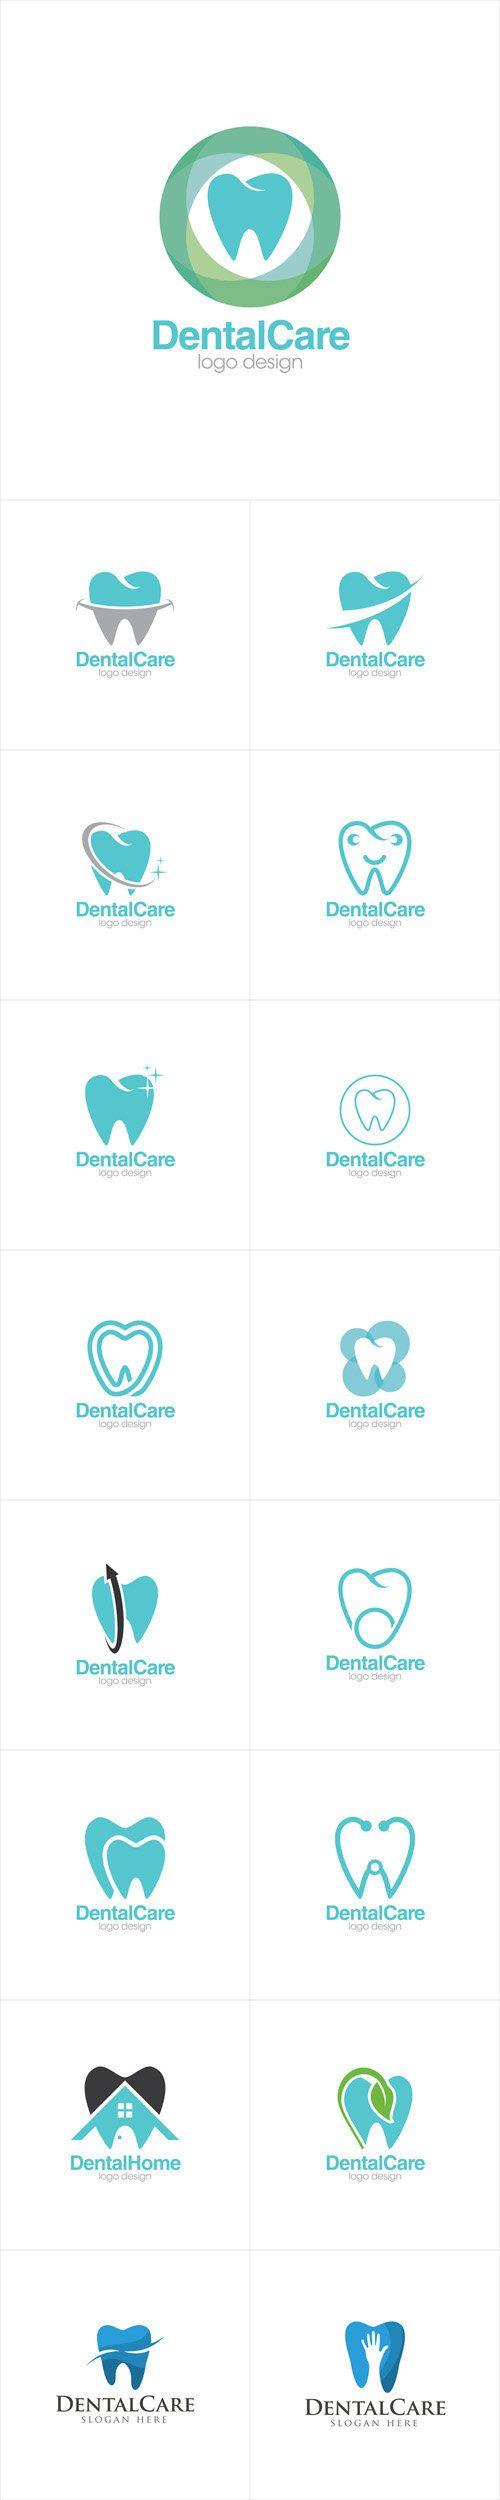 Vectors - Dental Care Creative Concept Logo Design Templates